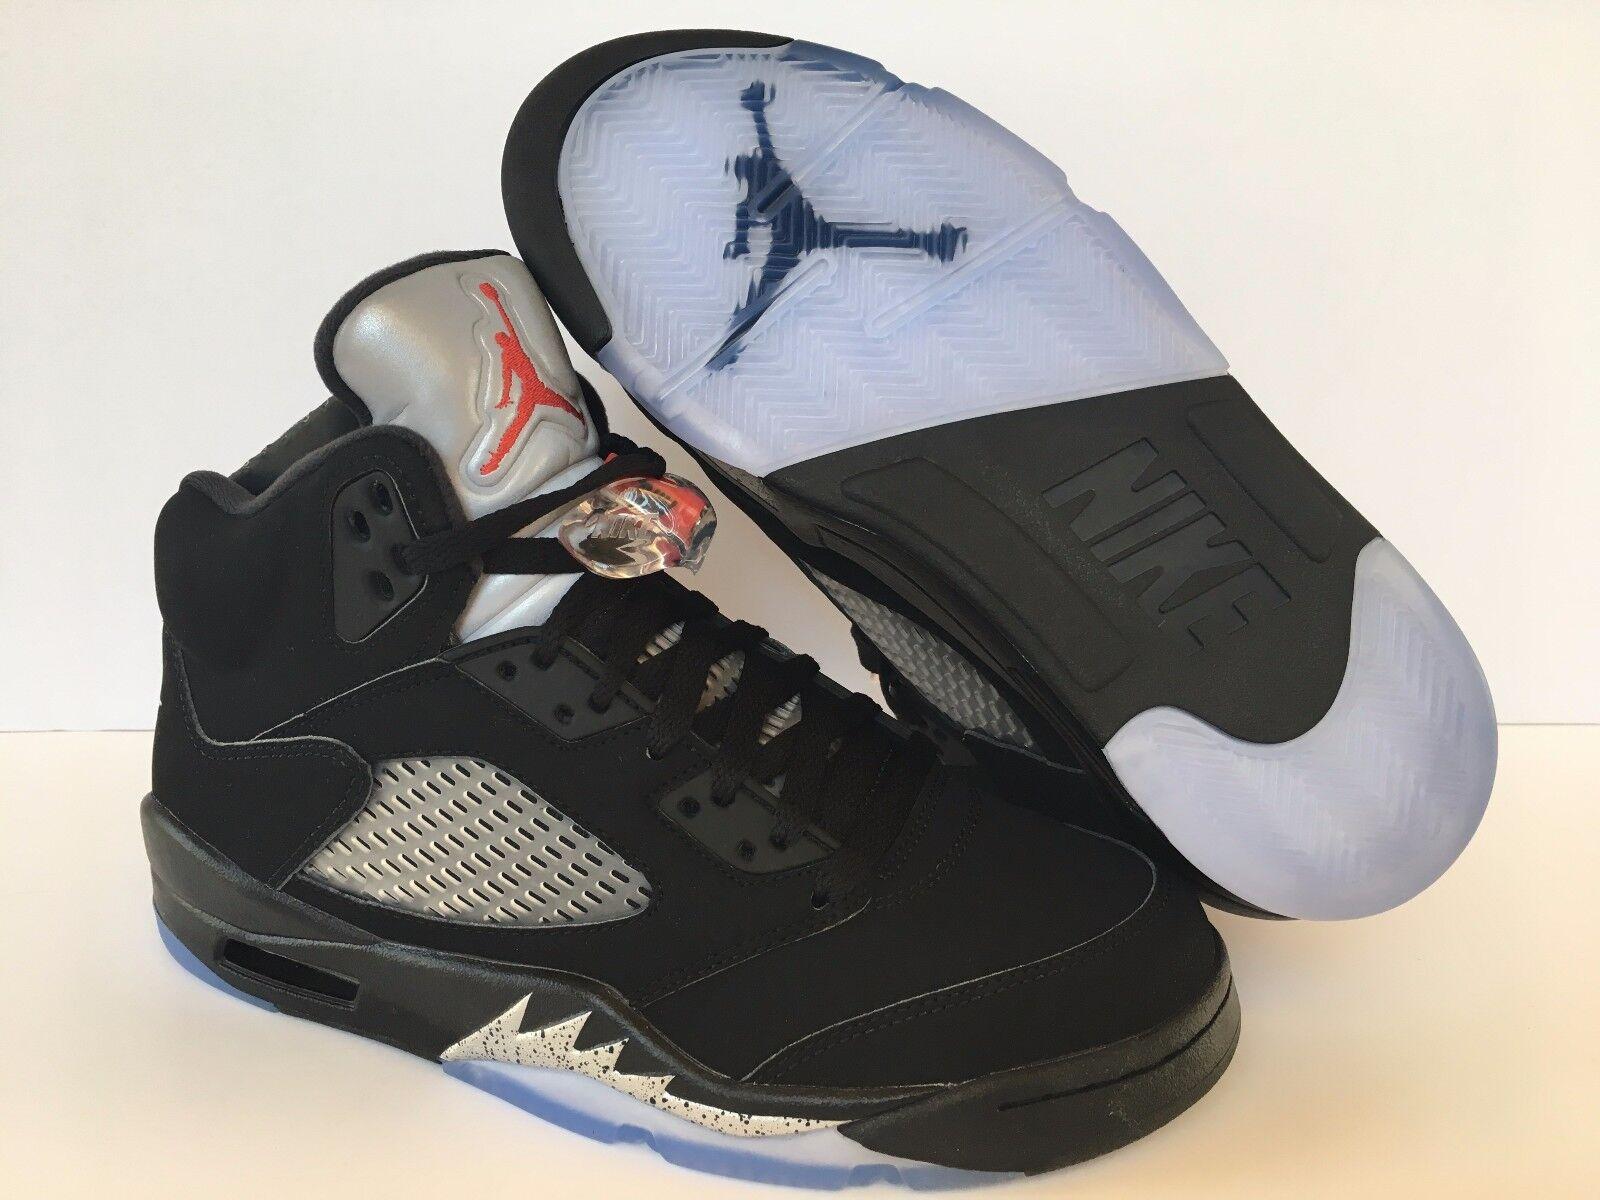 Nike air jordan uomini 5 retrò og scarpe rosso bianco d'argento 845035 003 sz 7